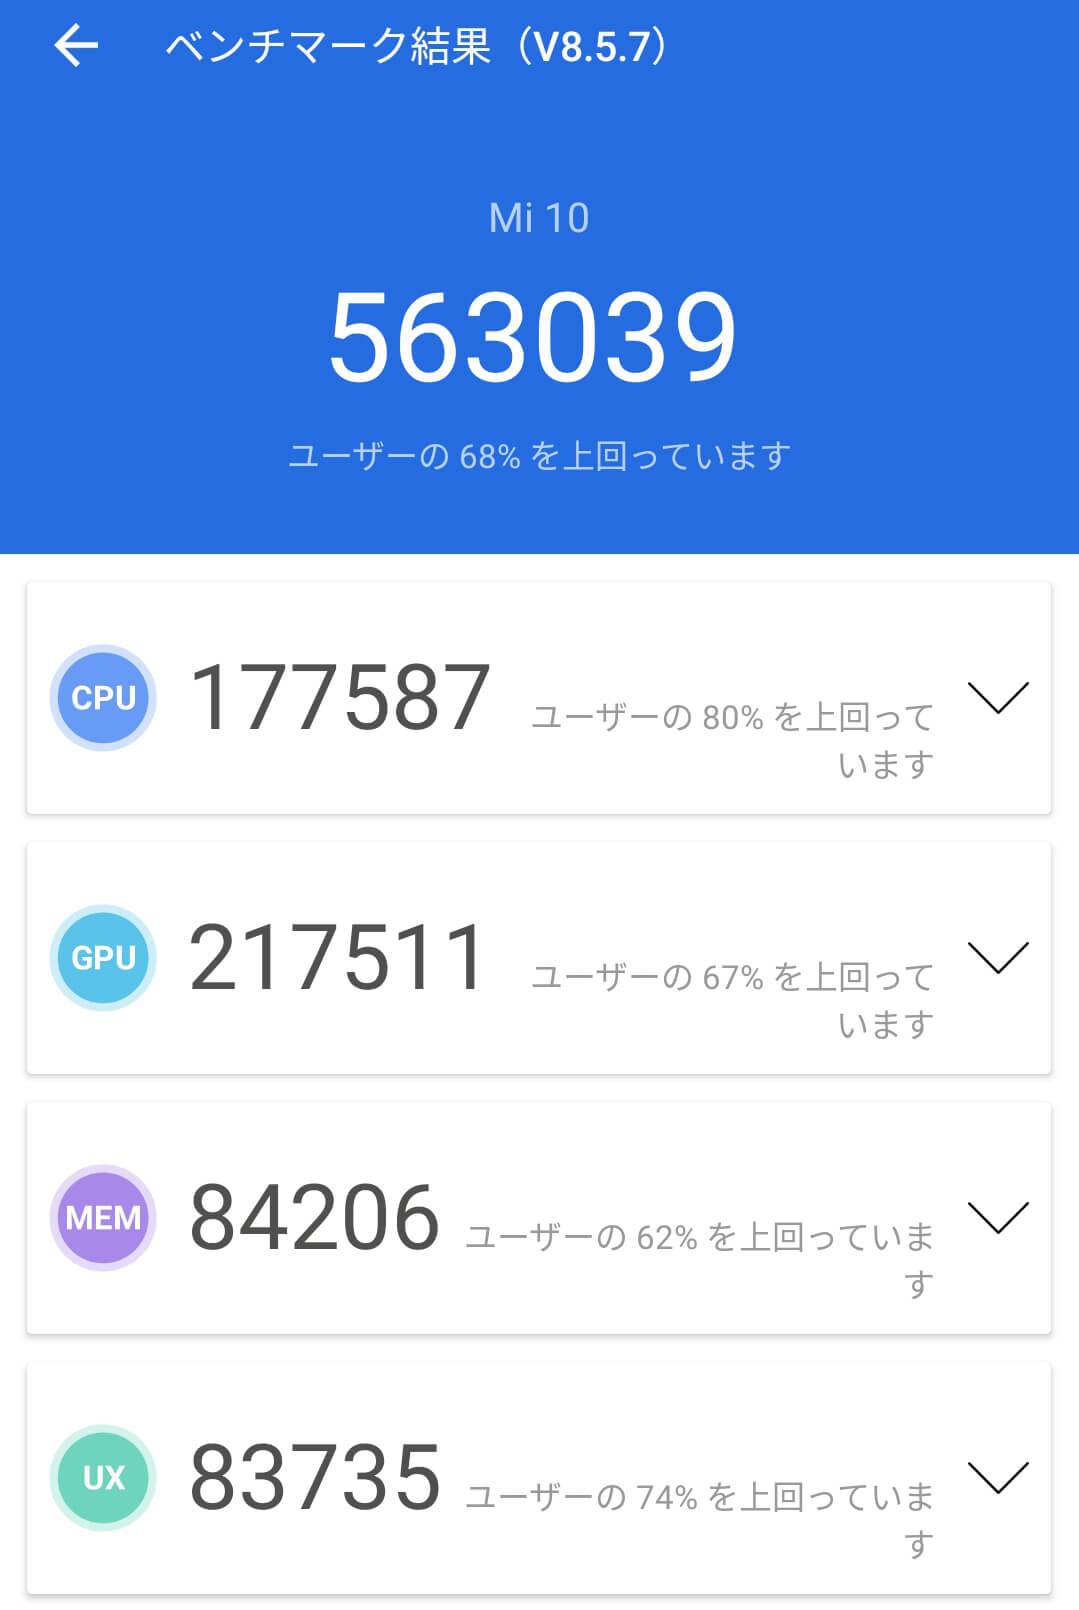 Xiaomi Mi 10のAntutuベンチマークスコア計測1回目は563039